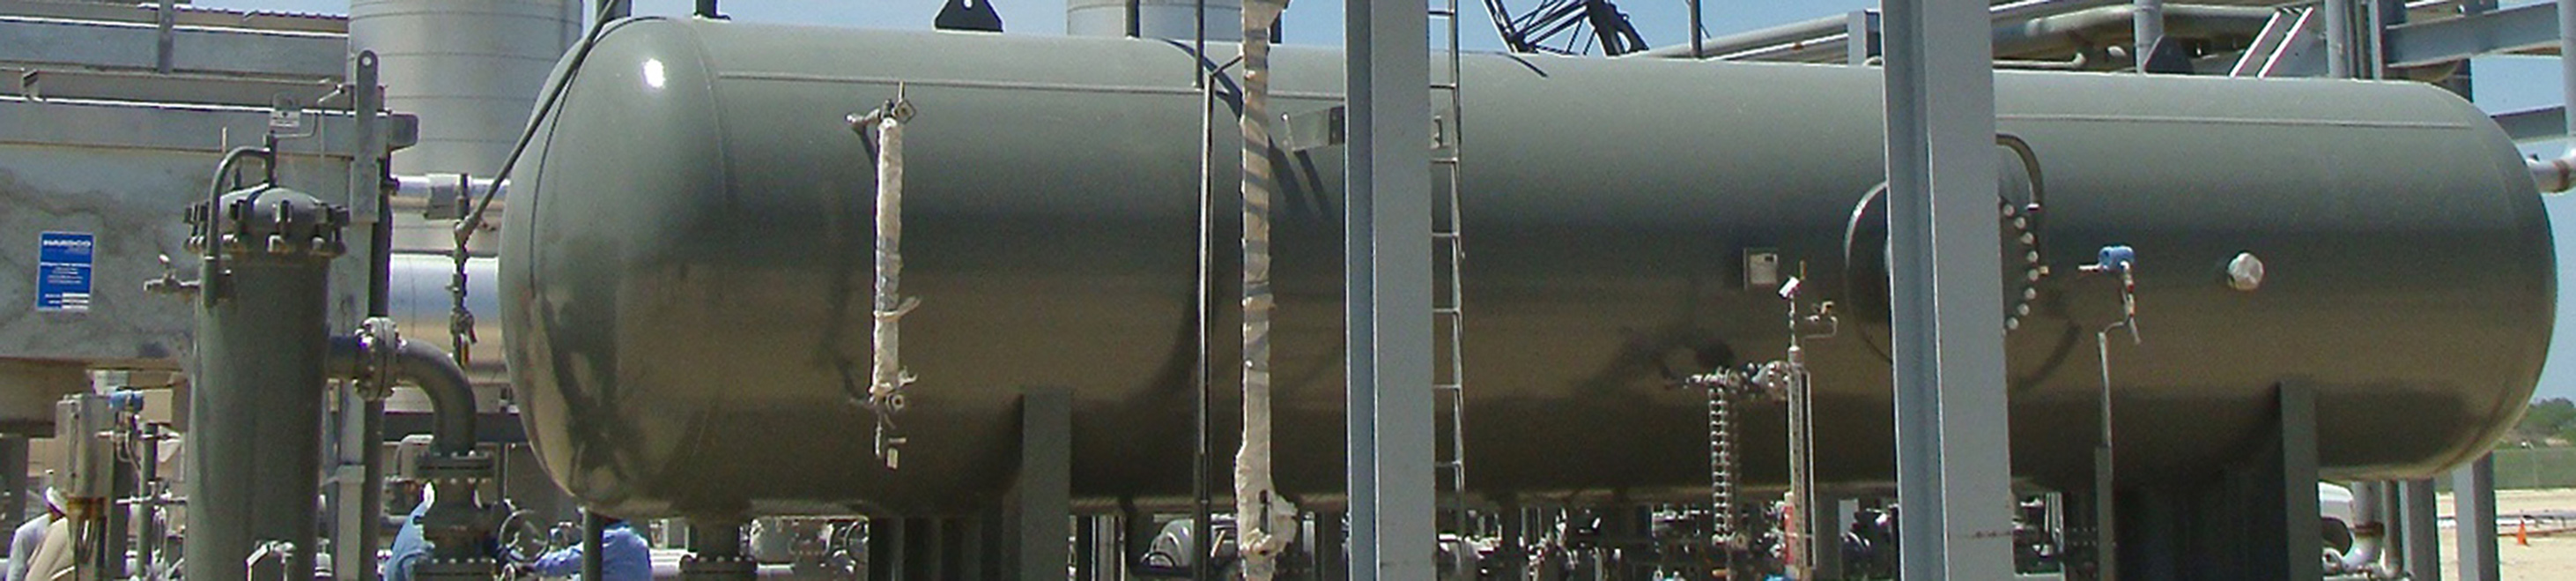 Oil & Gas Production Equipment Fabrication - ASME Custom Fabrication_3